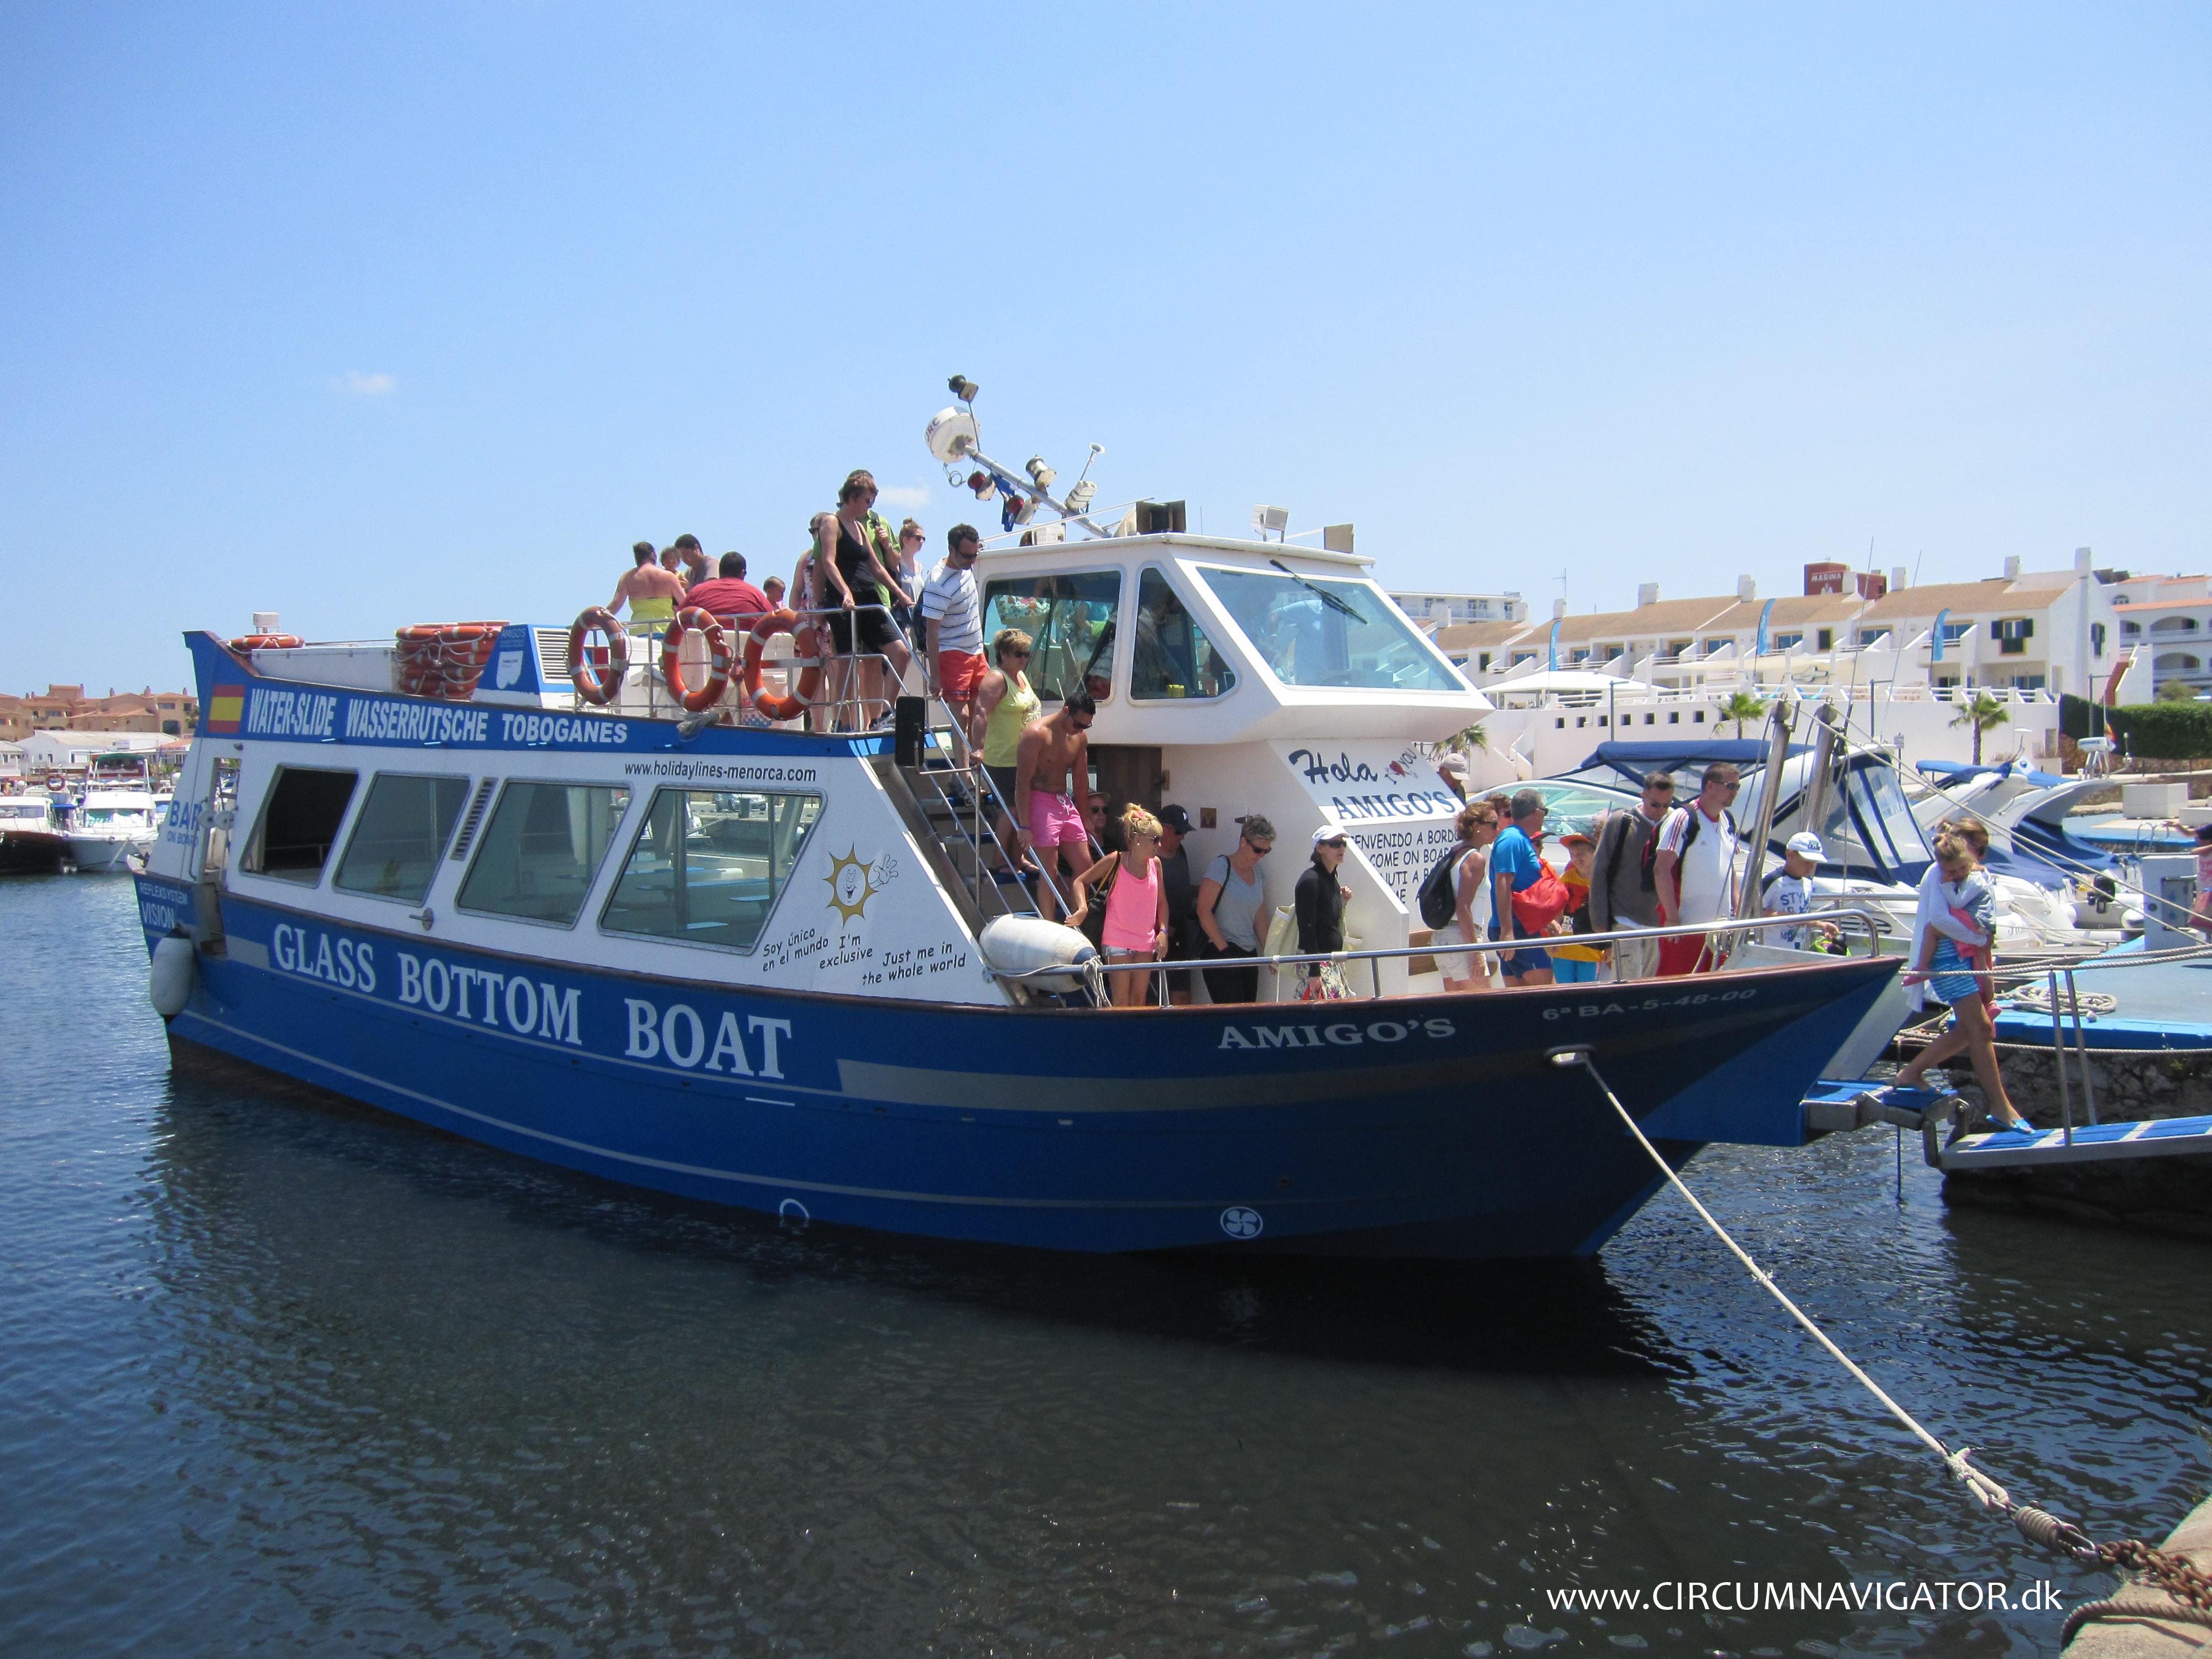 Amigos Glass Bottom Boat Menorca